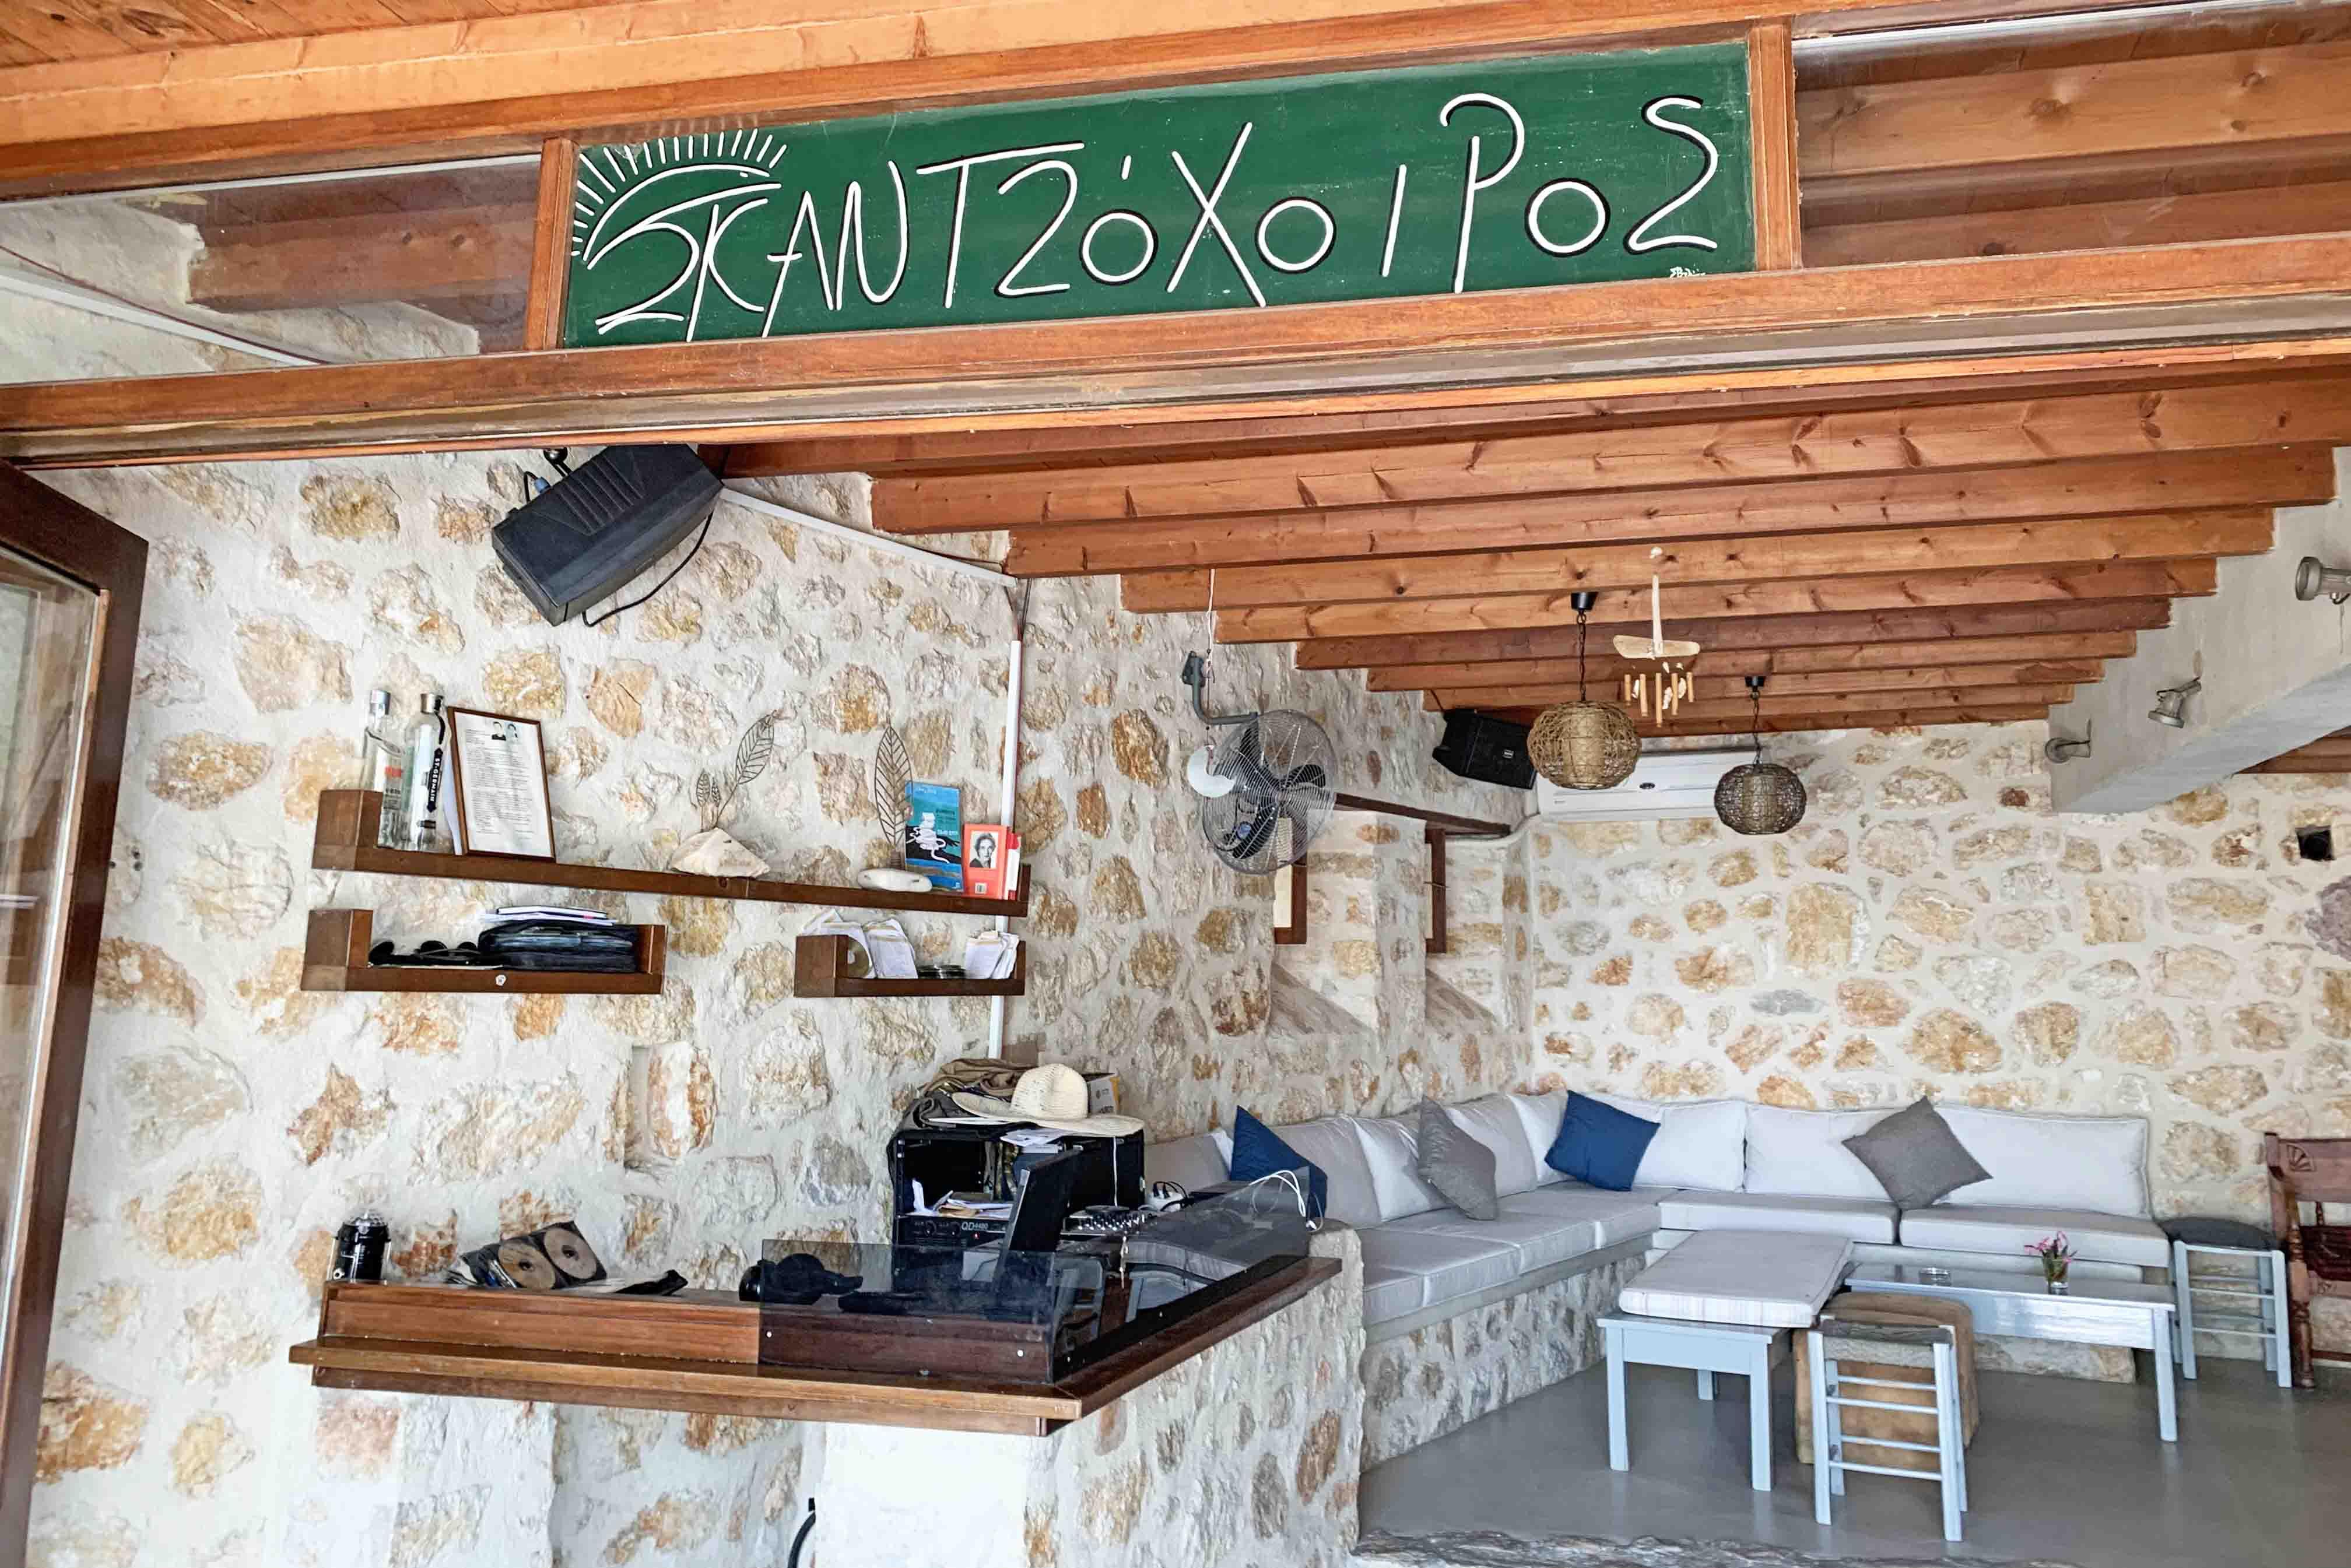 Skantzoxoiros Donoussa - bar cafe restaurant